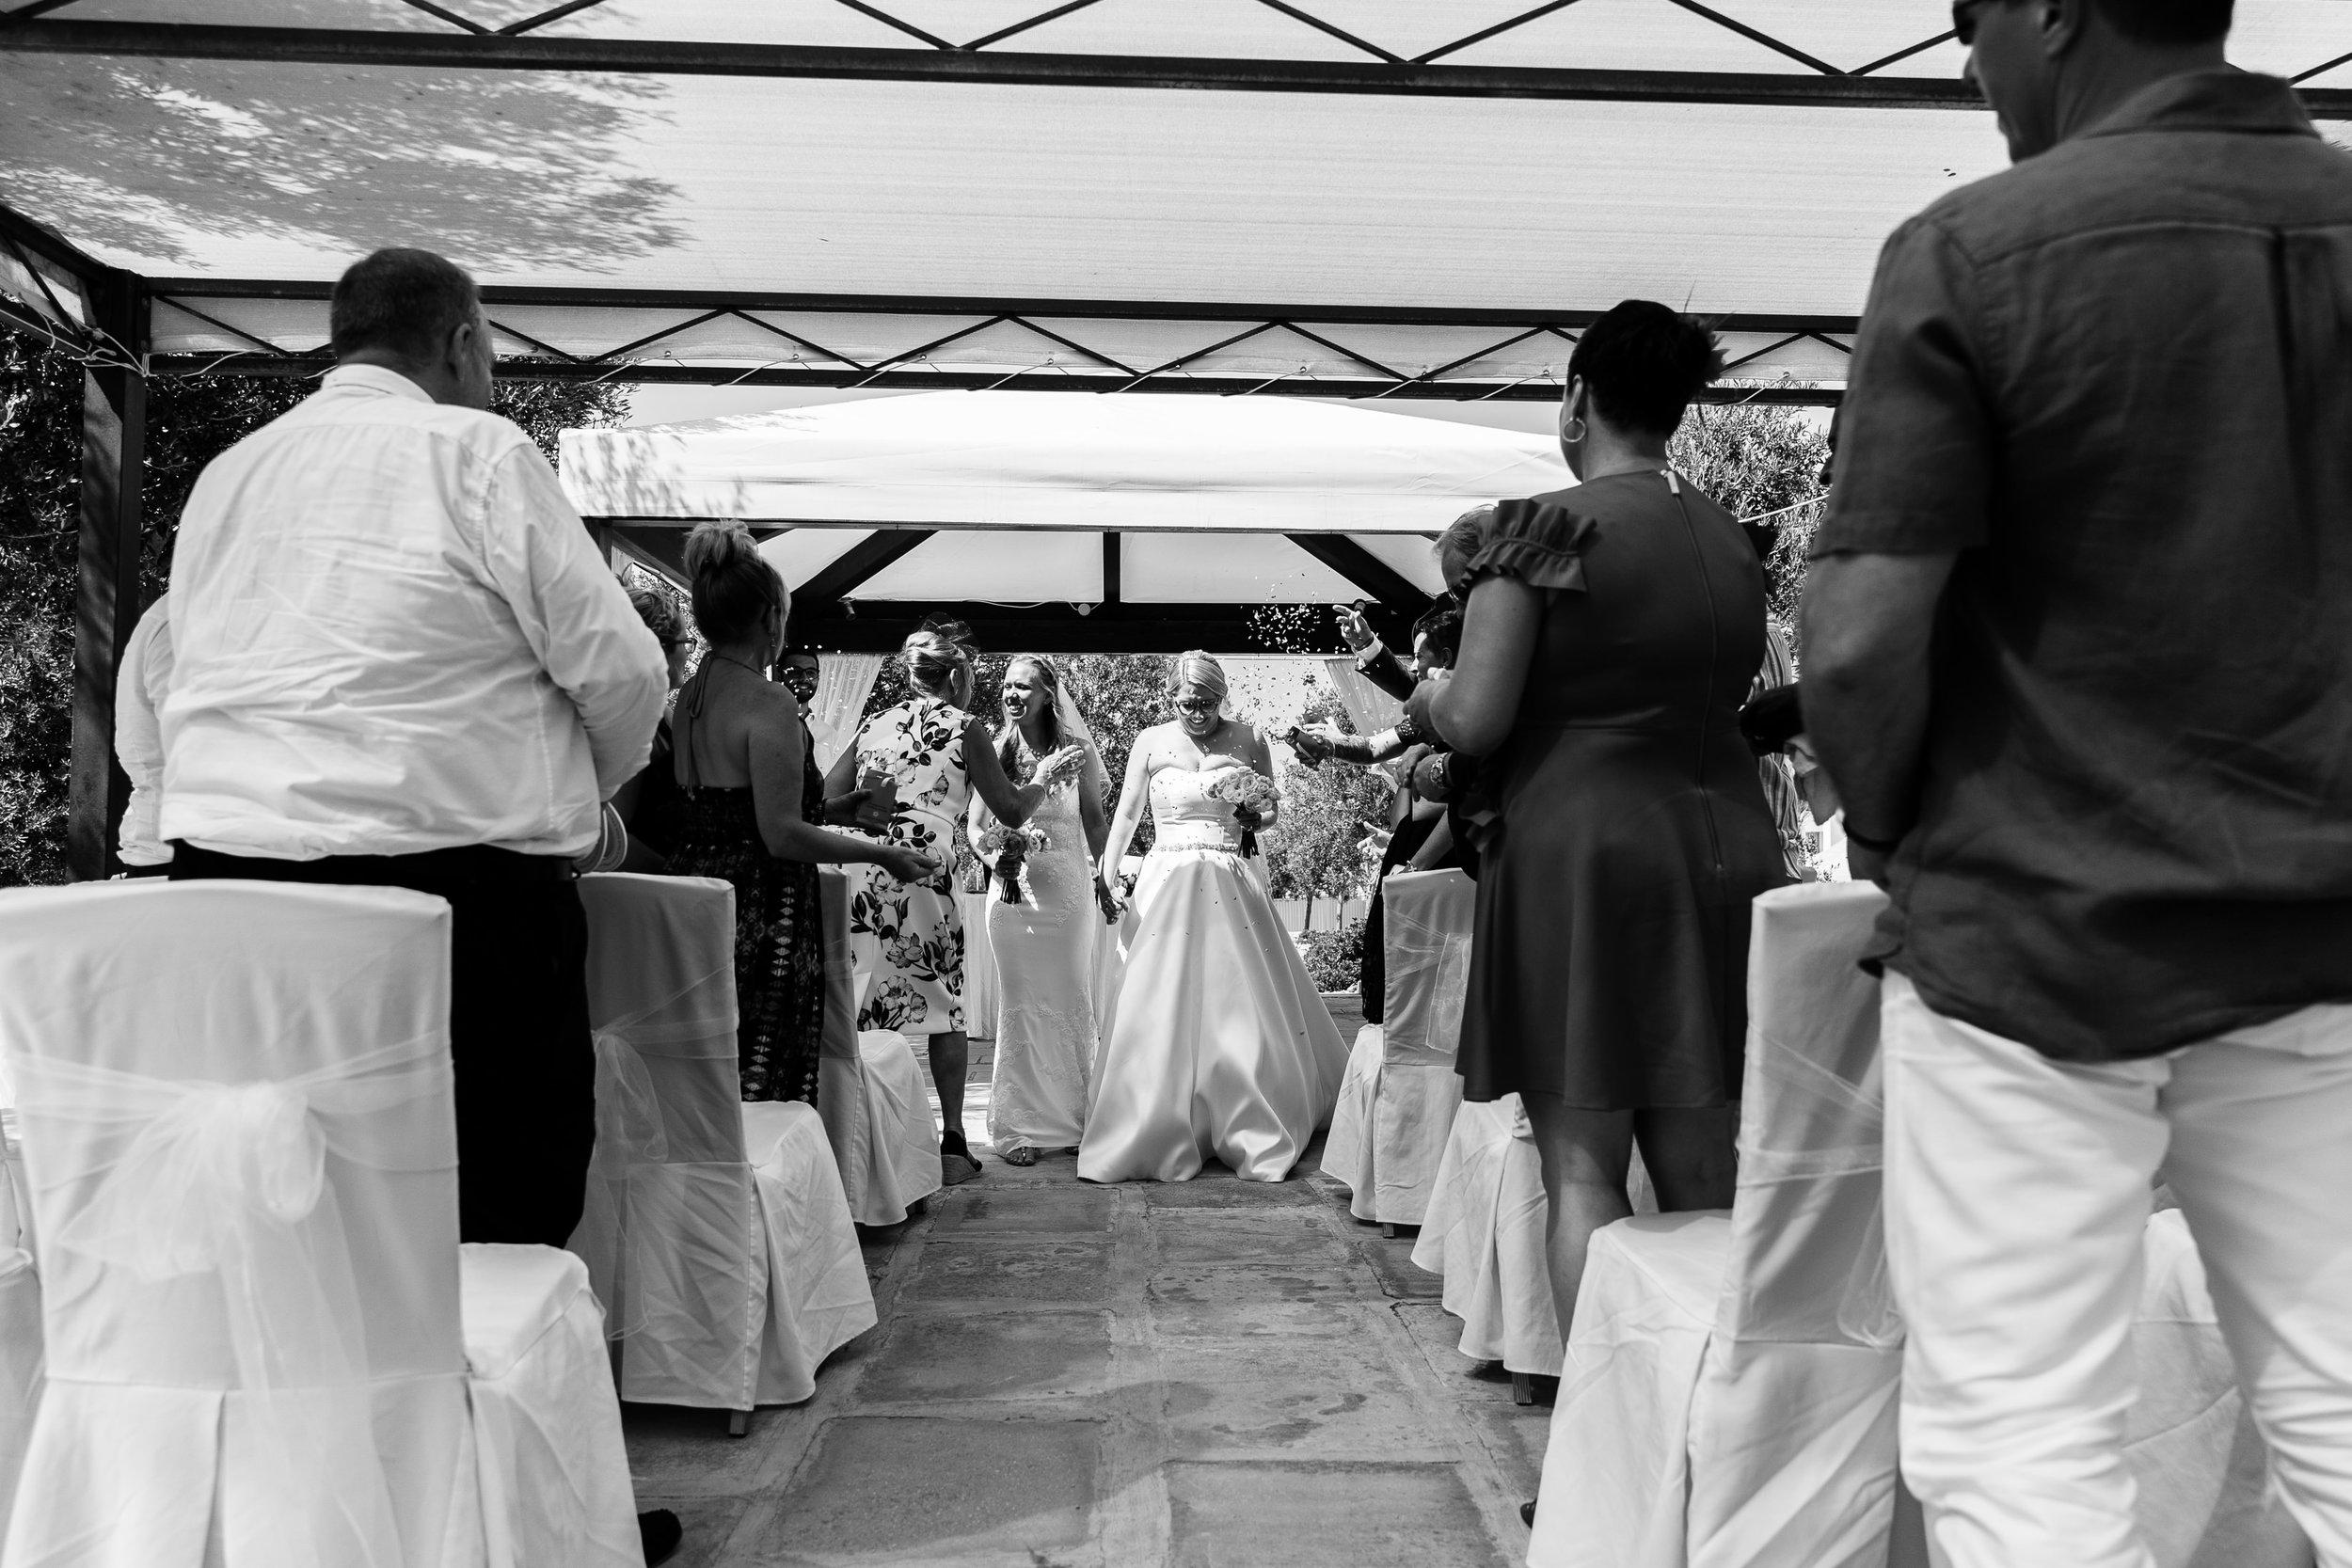 Malta_wedding_photography-69.jpg